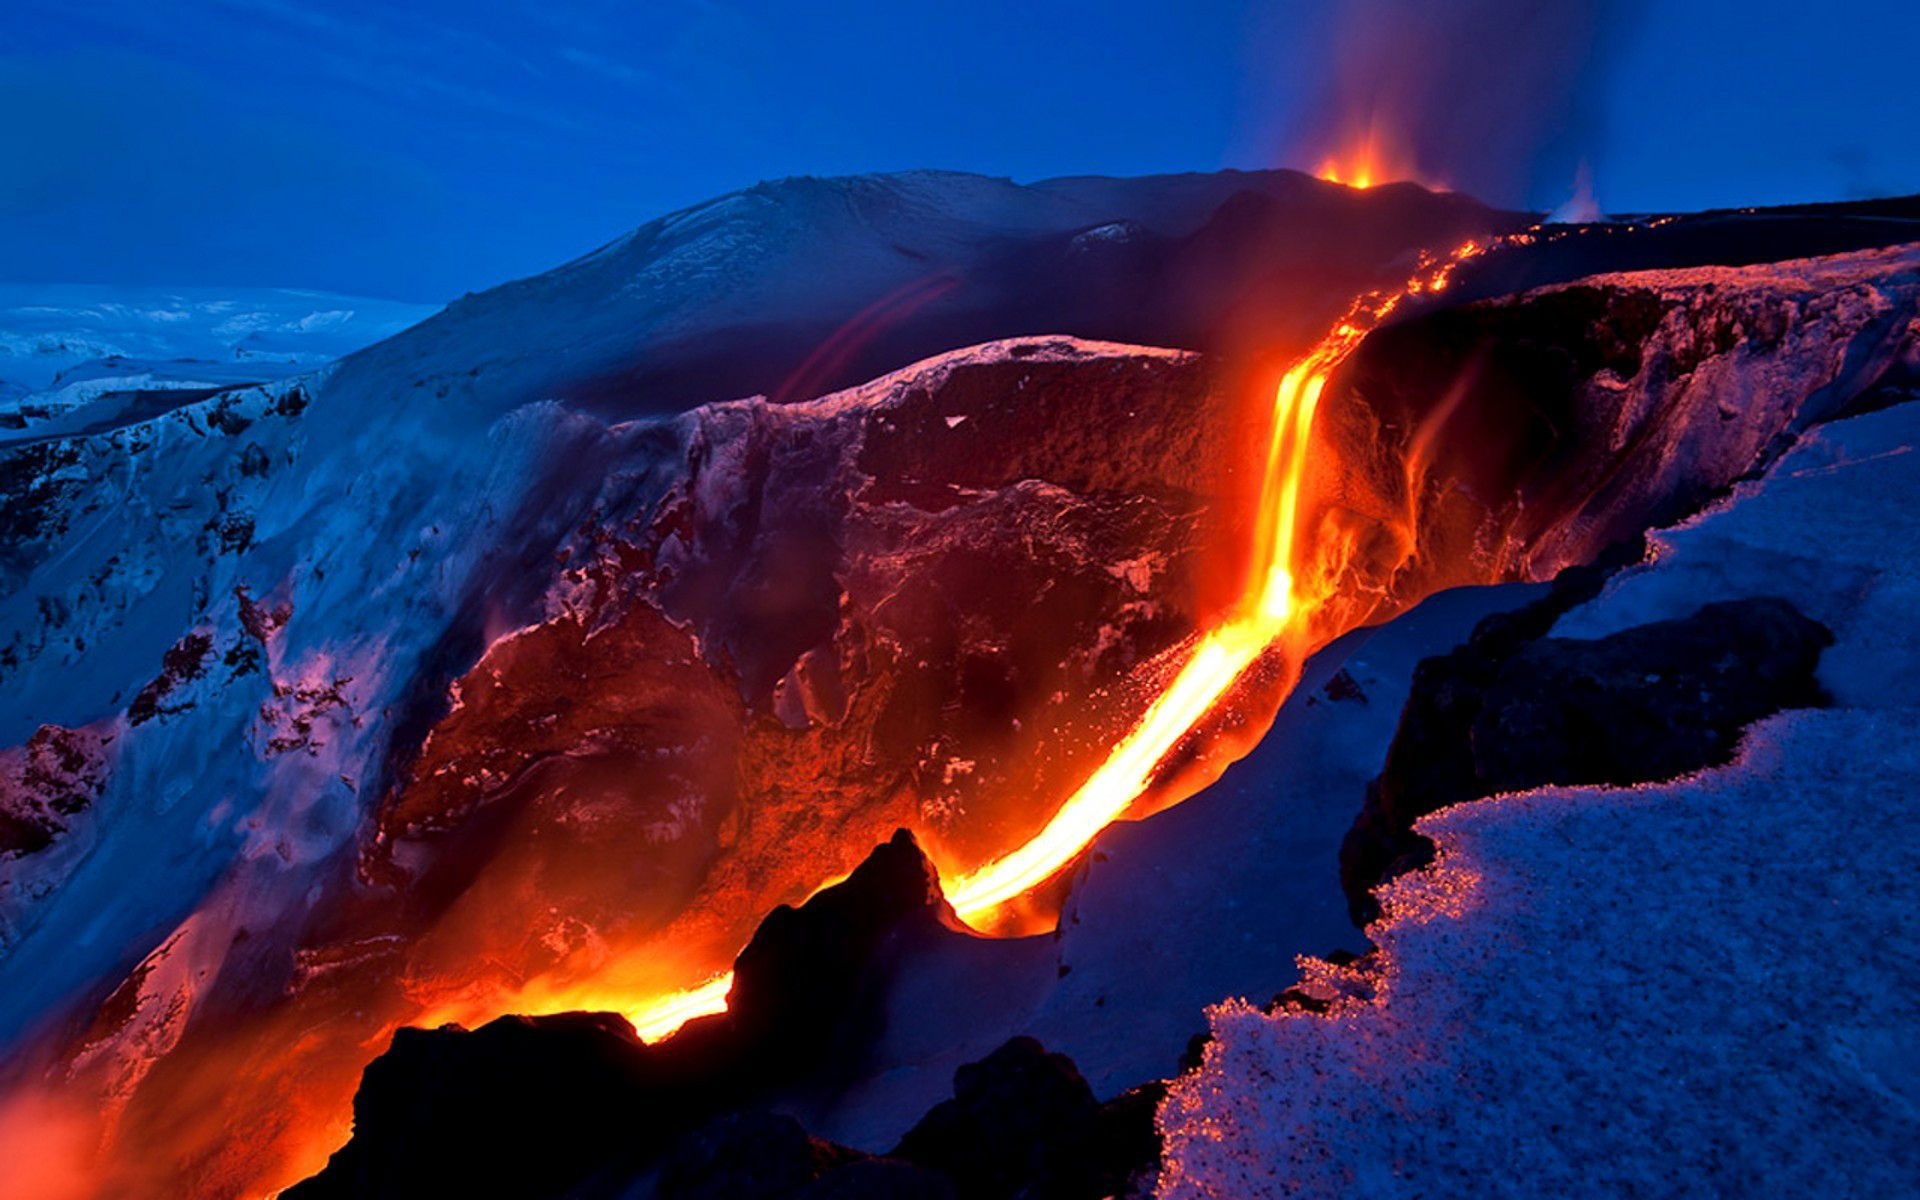 Volcano Wallpaper Picture designing